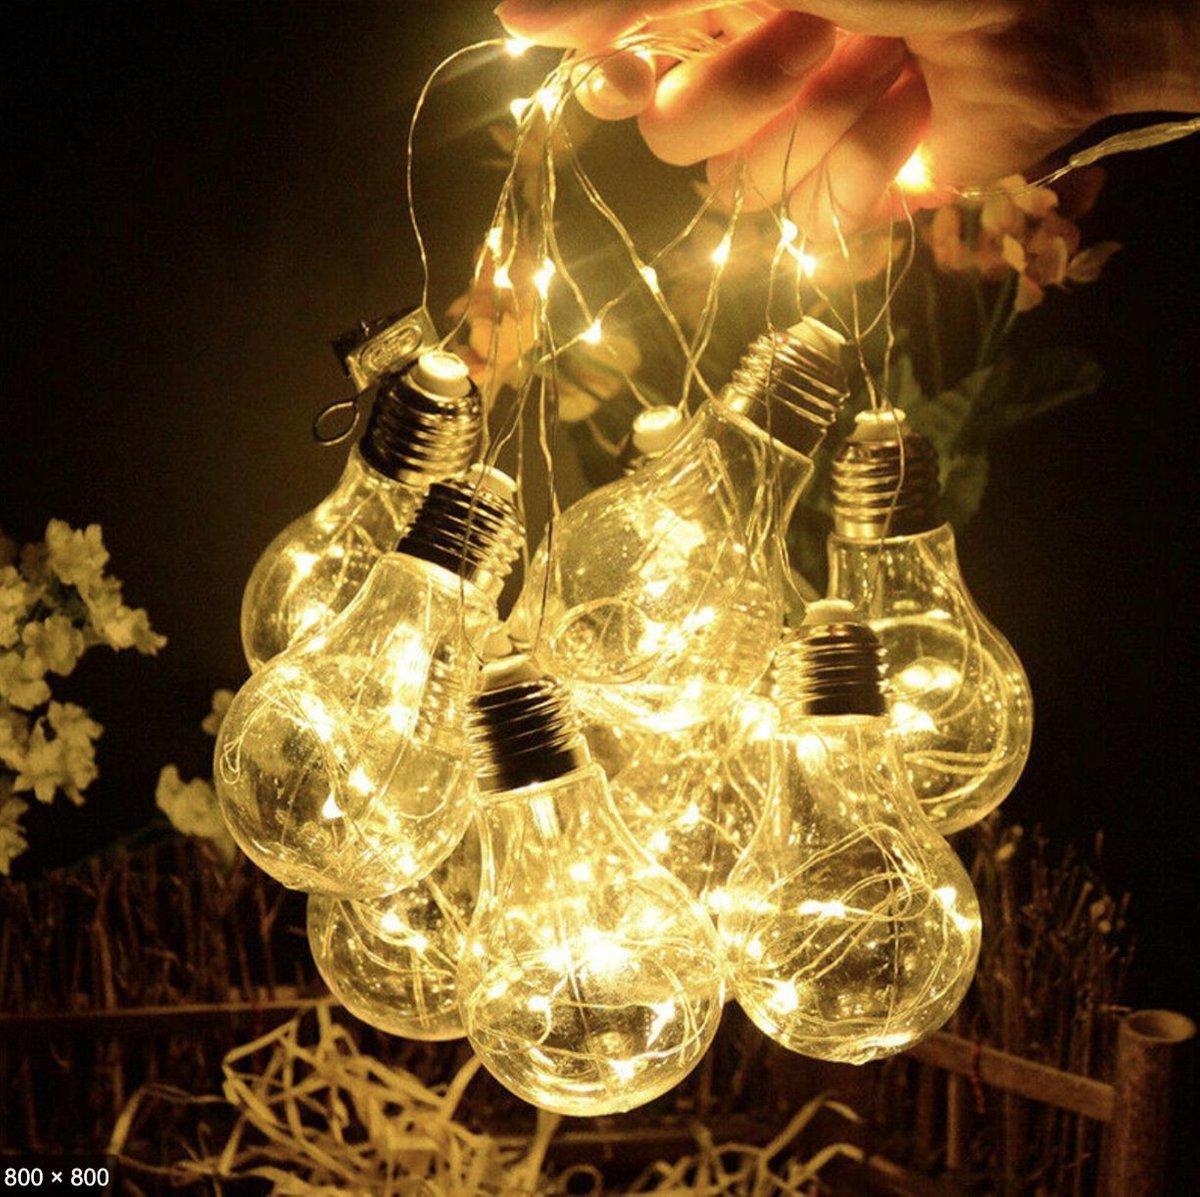 J-Pro Sfeer- en Tuinverlichting op Zonne-Energie - 10 Magic Lampen 100 LED 7m - Lichtsnoer - Slinger